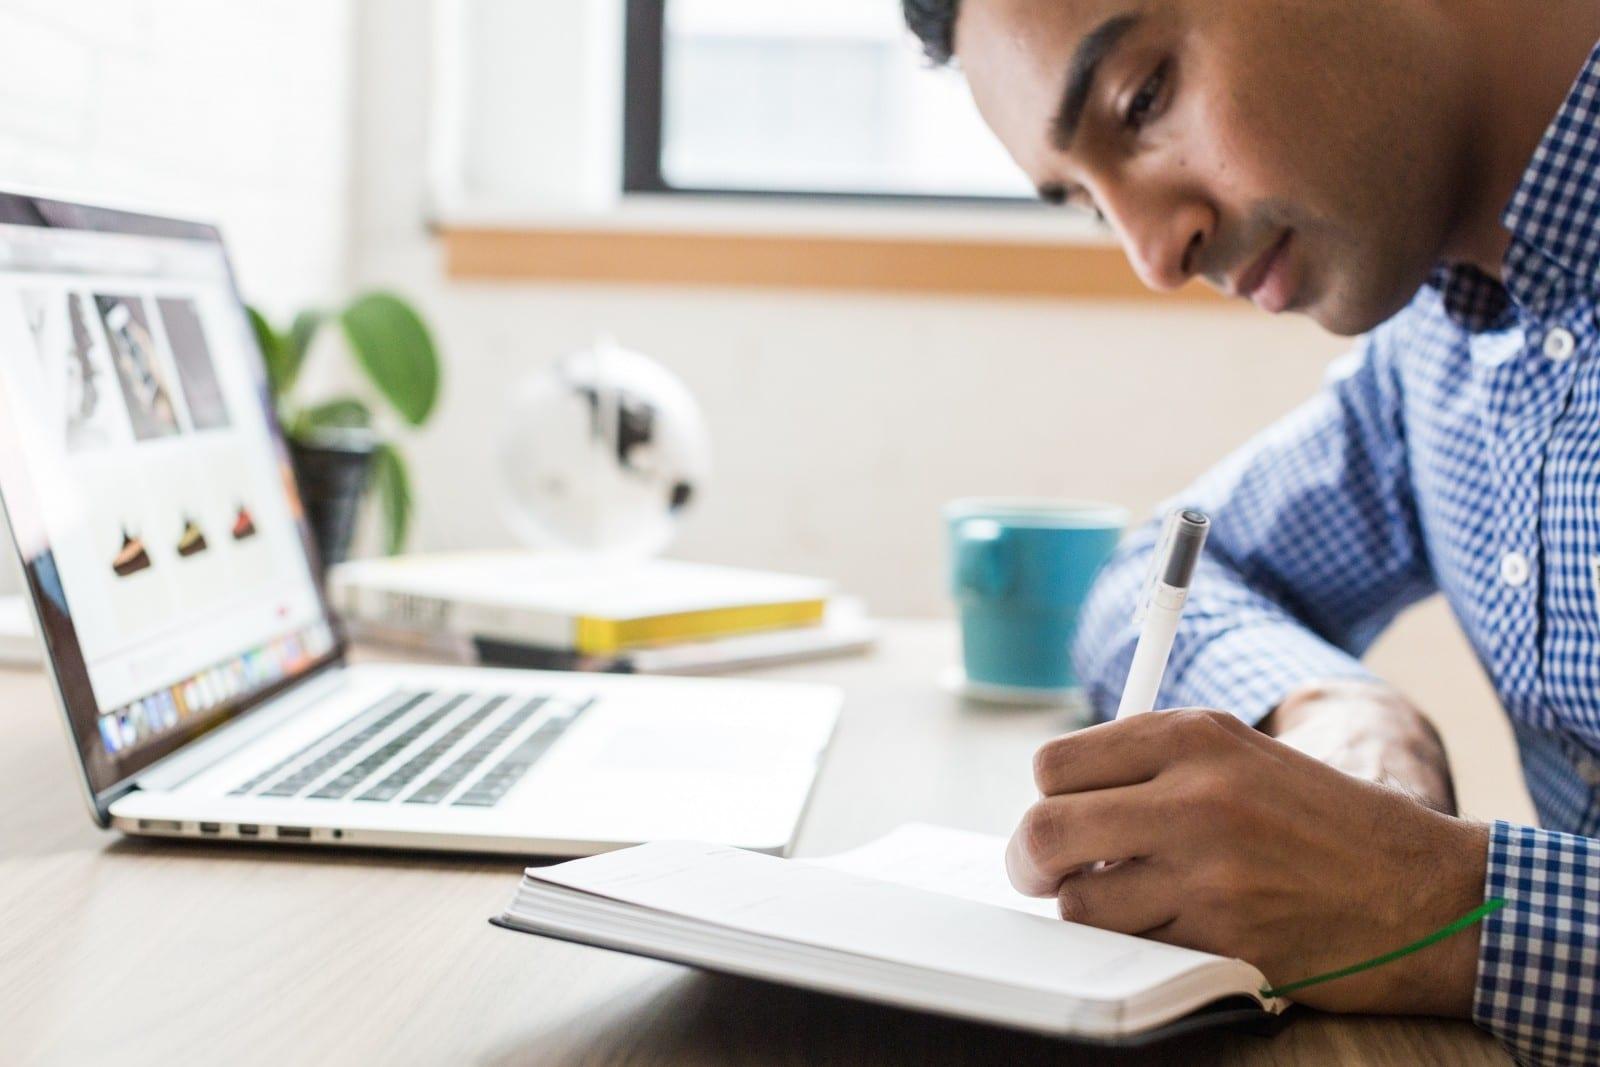 Helpful tips for formatting a TEFL/TESOL resume